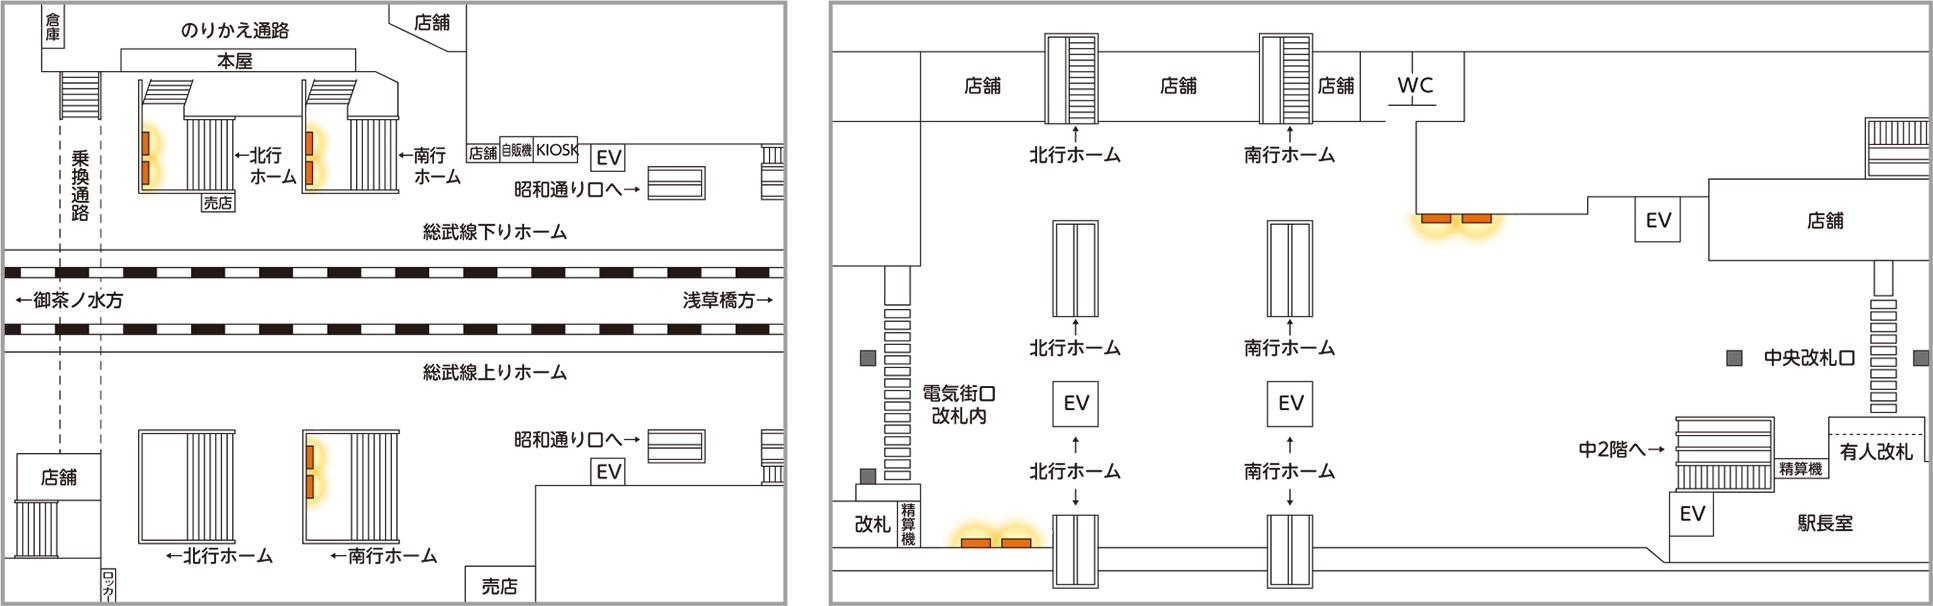 JR東日本 駅ポスター 秋葉原セット 掲出位置図